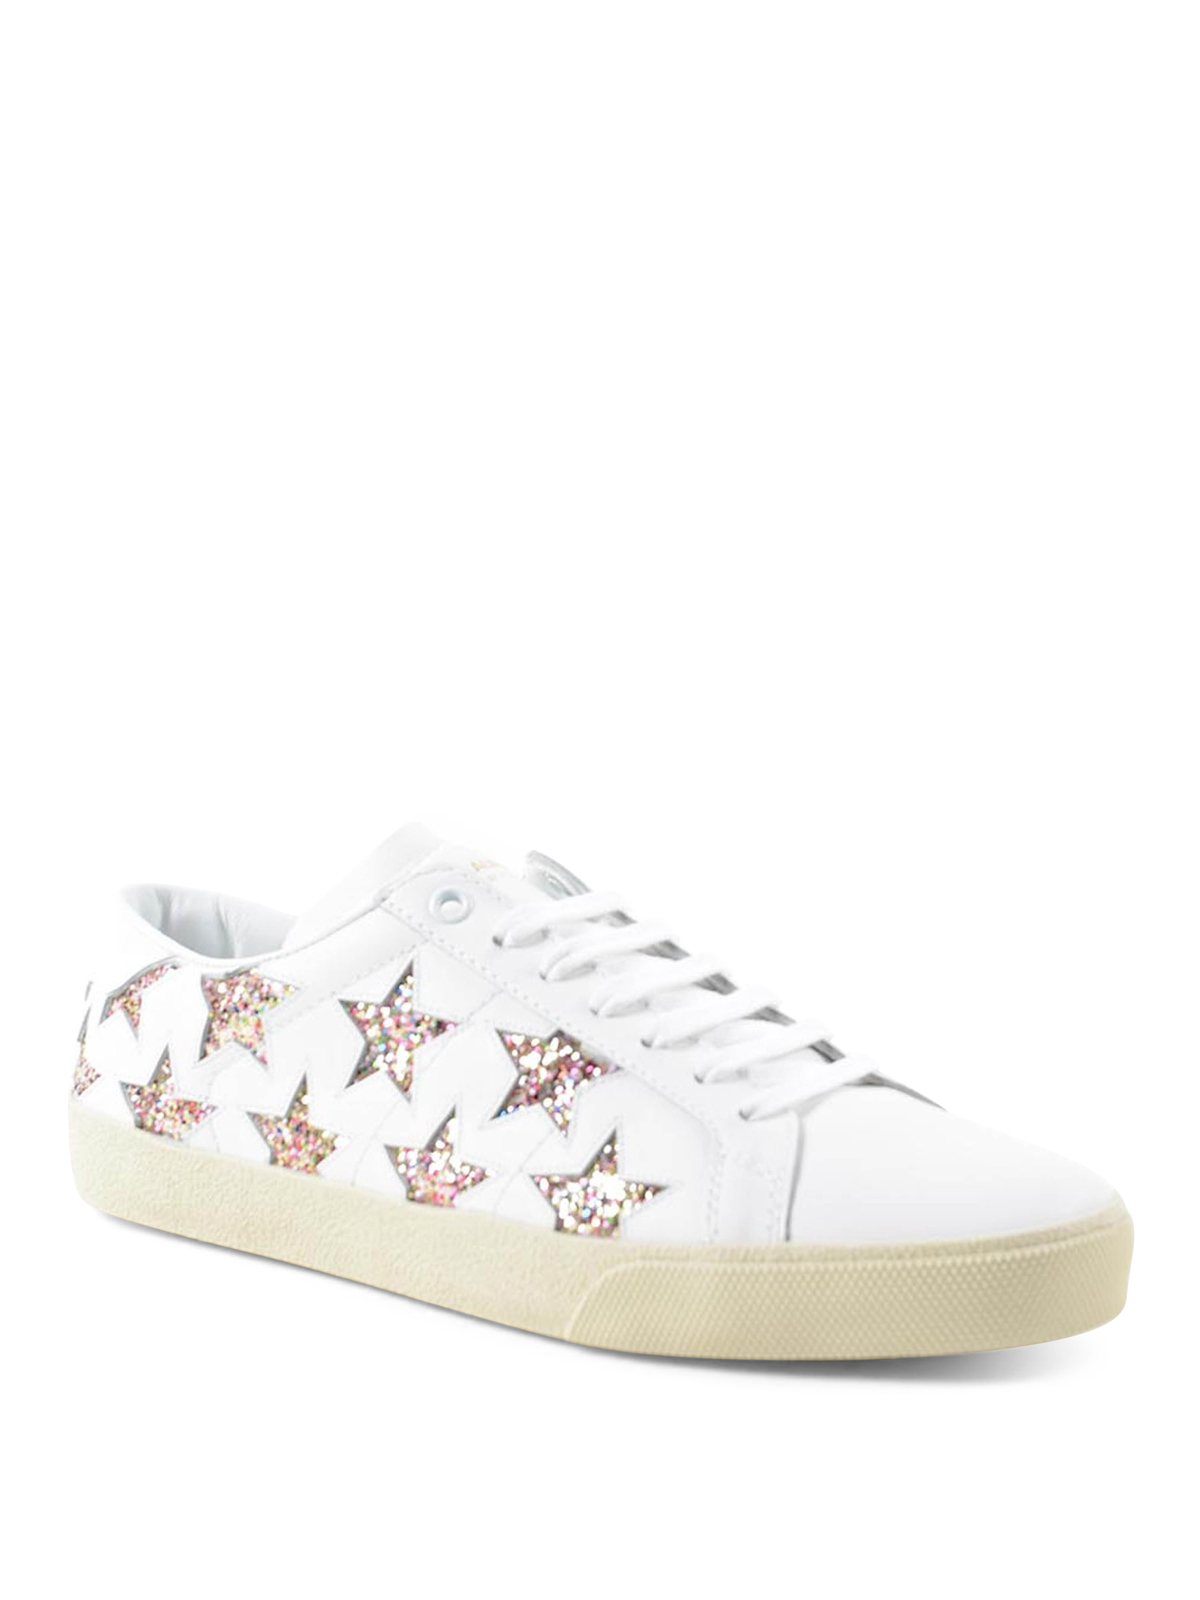 6252d8b1d saint-laurent-trainers-online-star-glitter-sneakers-00000084796f00s002.jpg